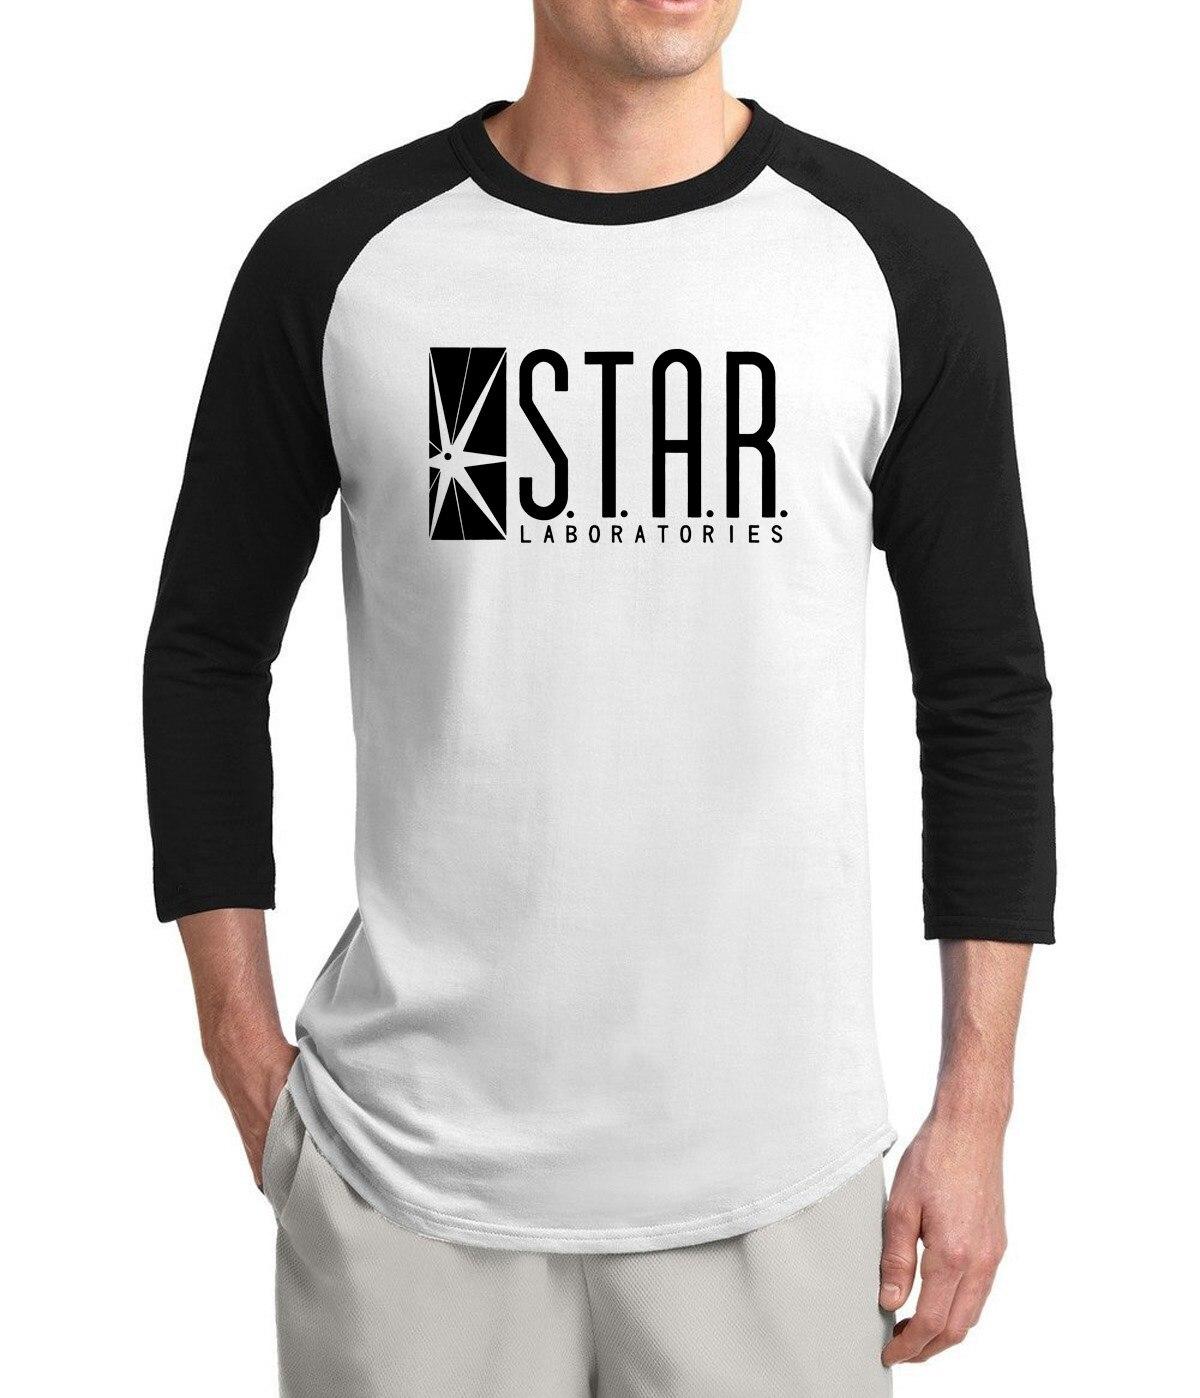 2019 verano gran oferta de camiseta para hombre STAR S. t. A. R. labs camisetas de manga de tres cuartos de algodón de moda para hombres